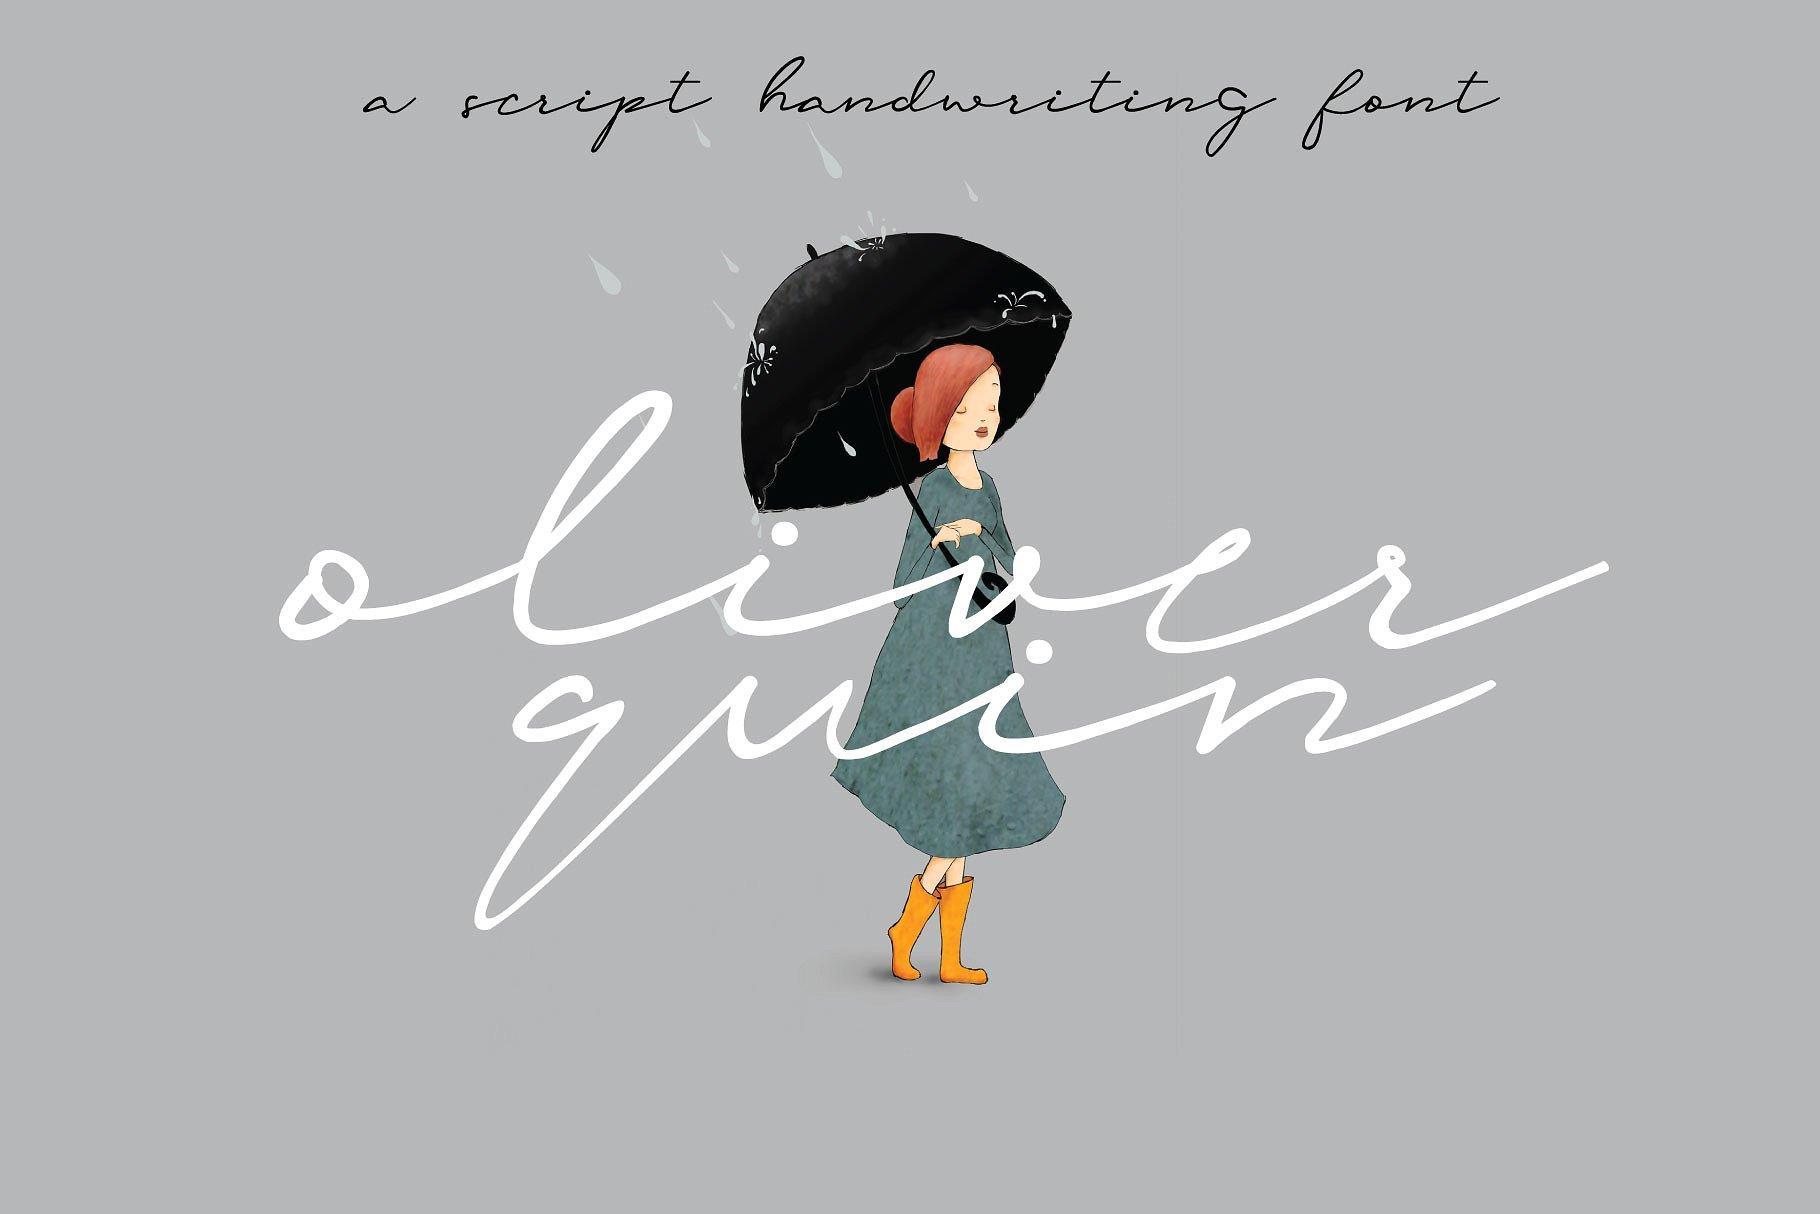 oliverquin创意手绘漫画个性签名海报英文字体下载